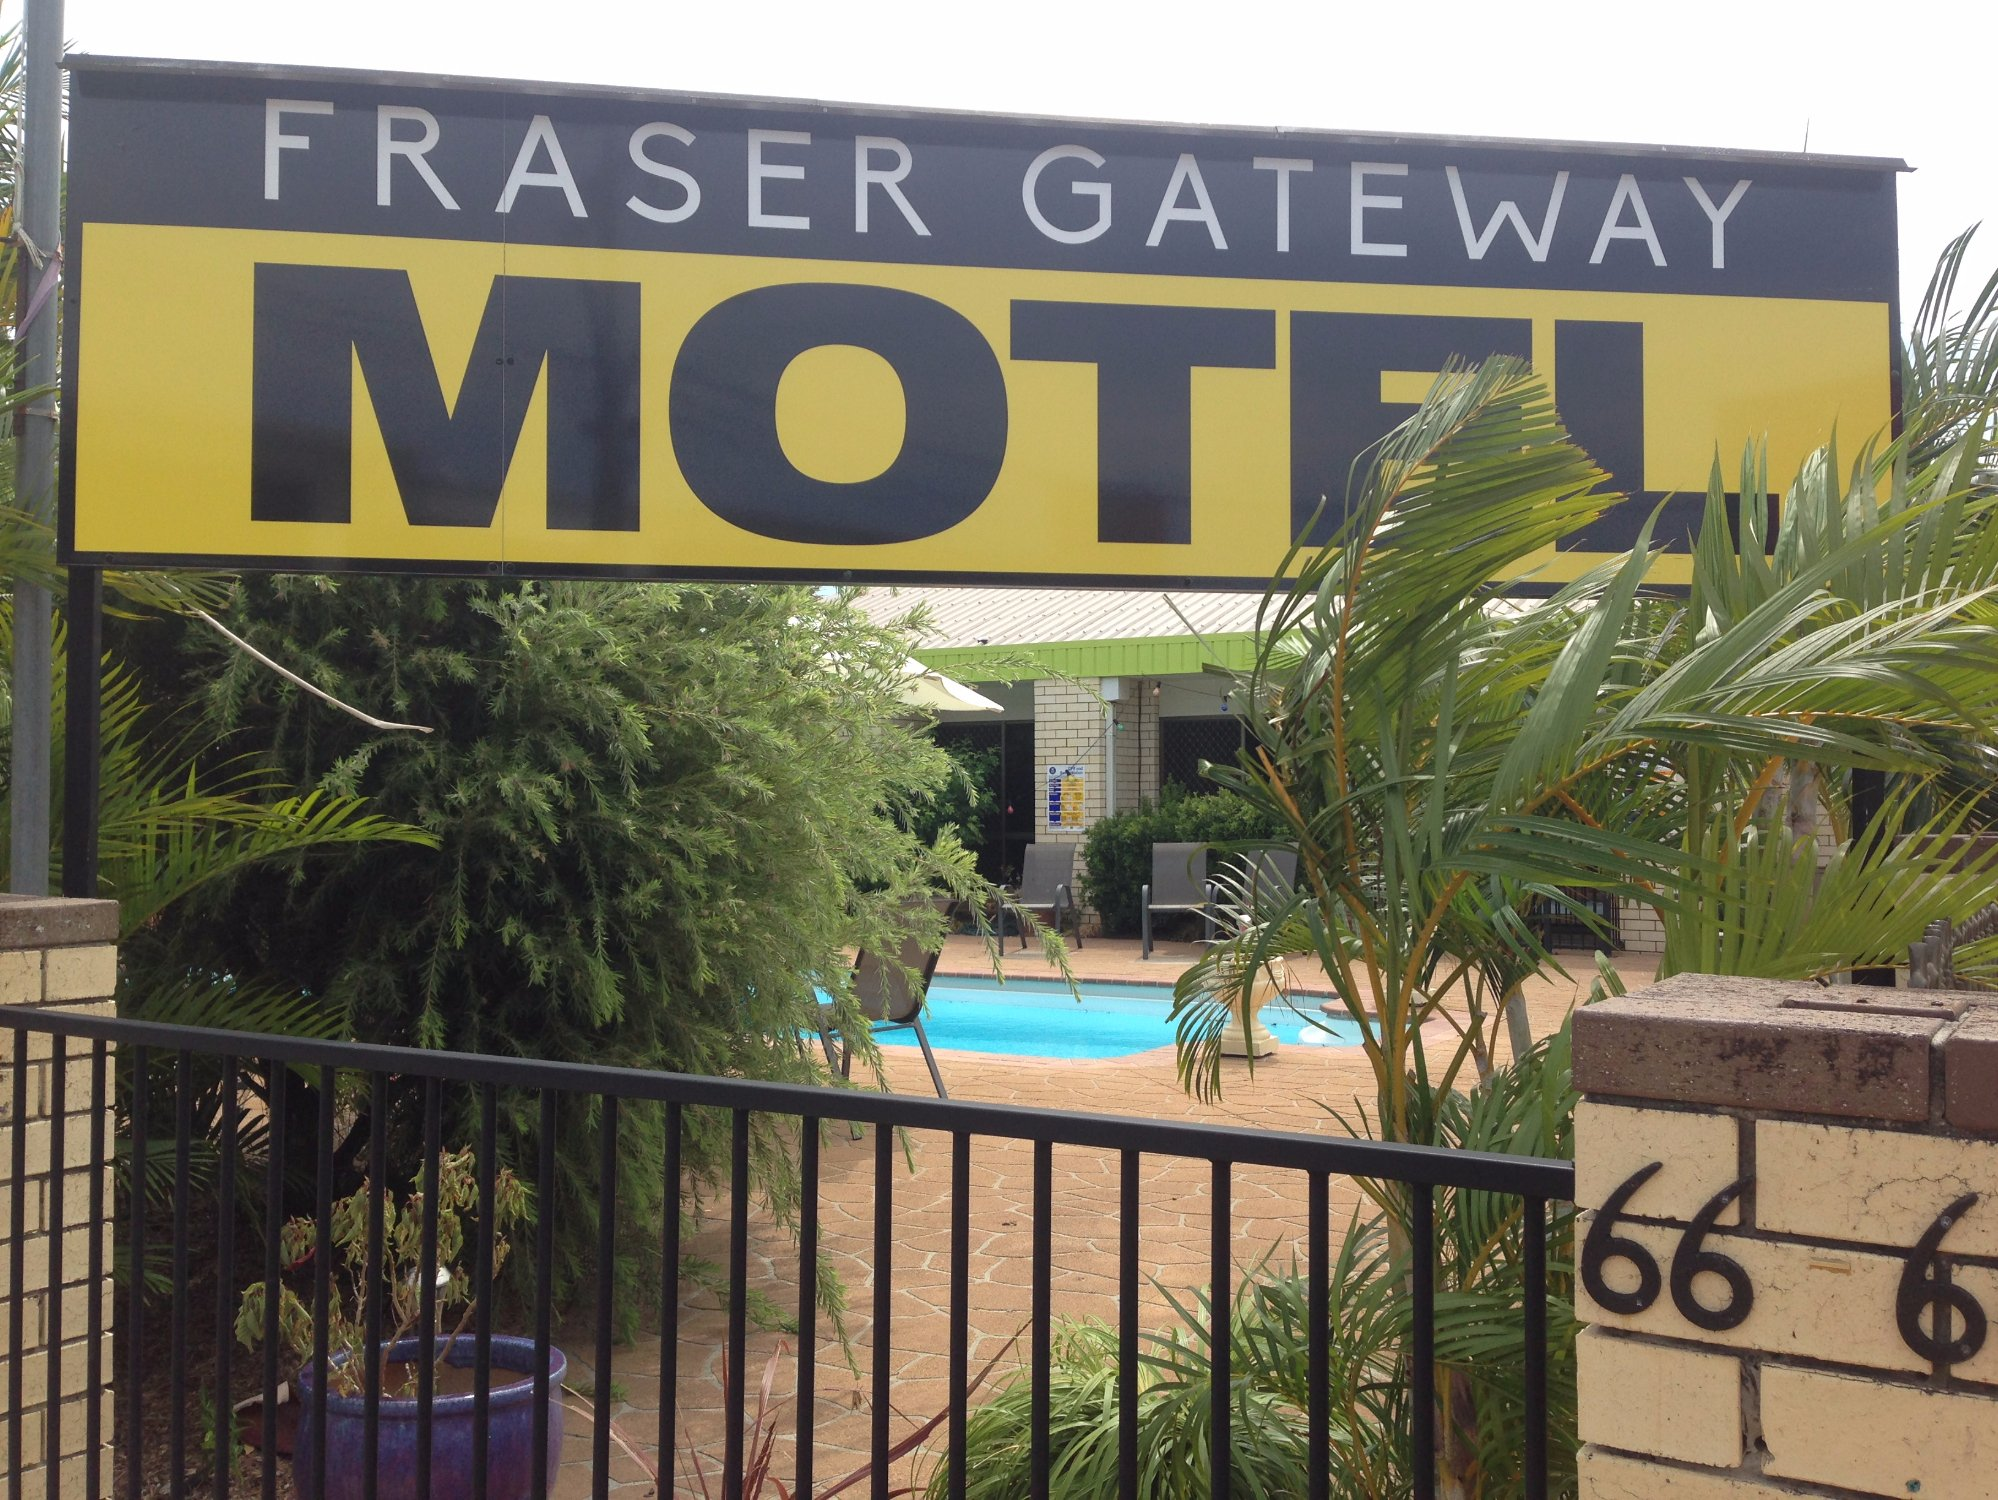 Econo Lodge Fraser Gateway